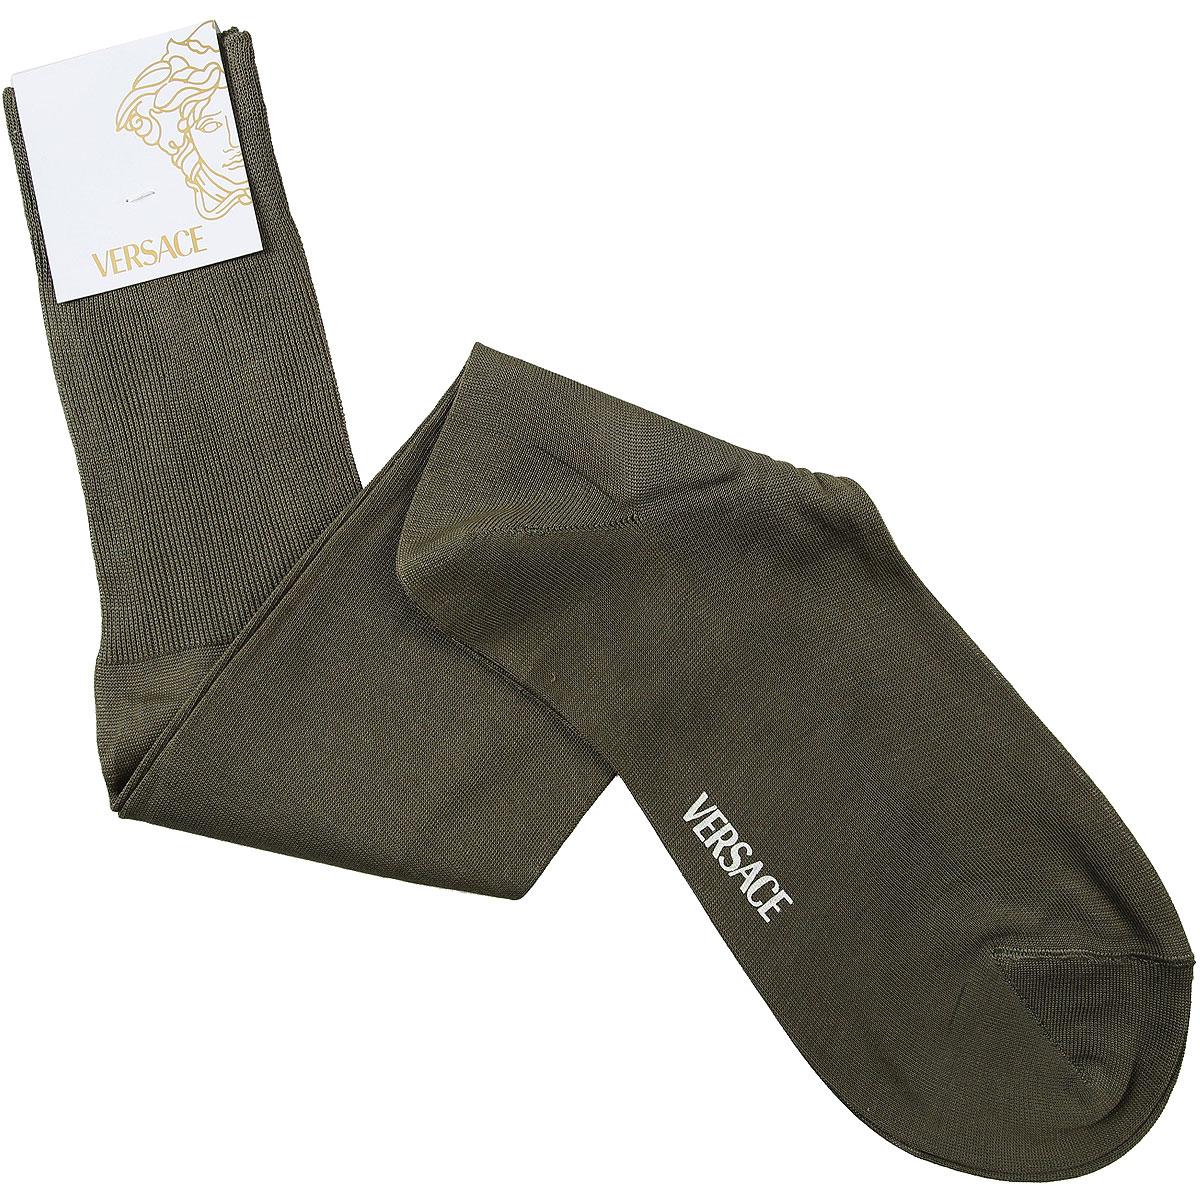 Versace Socks Socks for Men On Sale in Outlet, Military Green, Lisle Cotton Thread, 2019, 11 (Shoe Size: EU 43 - US 9) 11.5 (Shoe Size: EU 43.5 - US 9